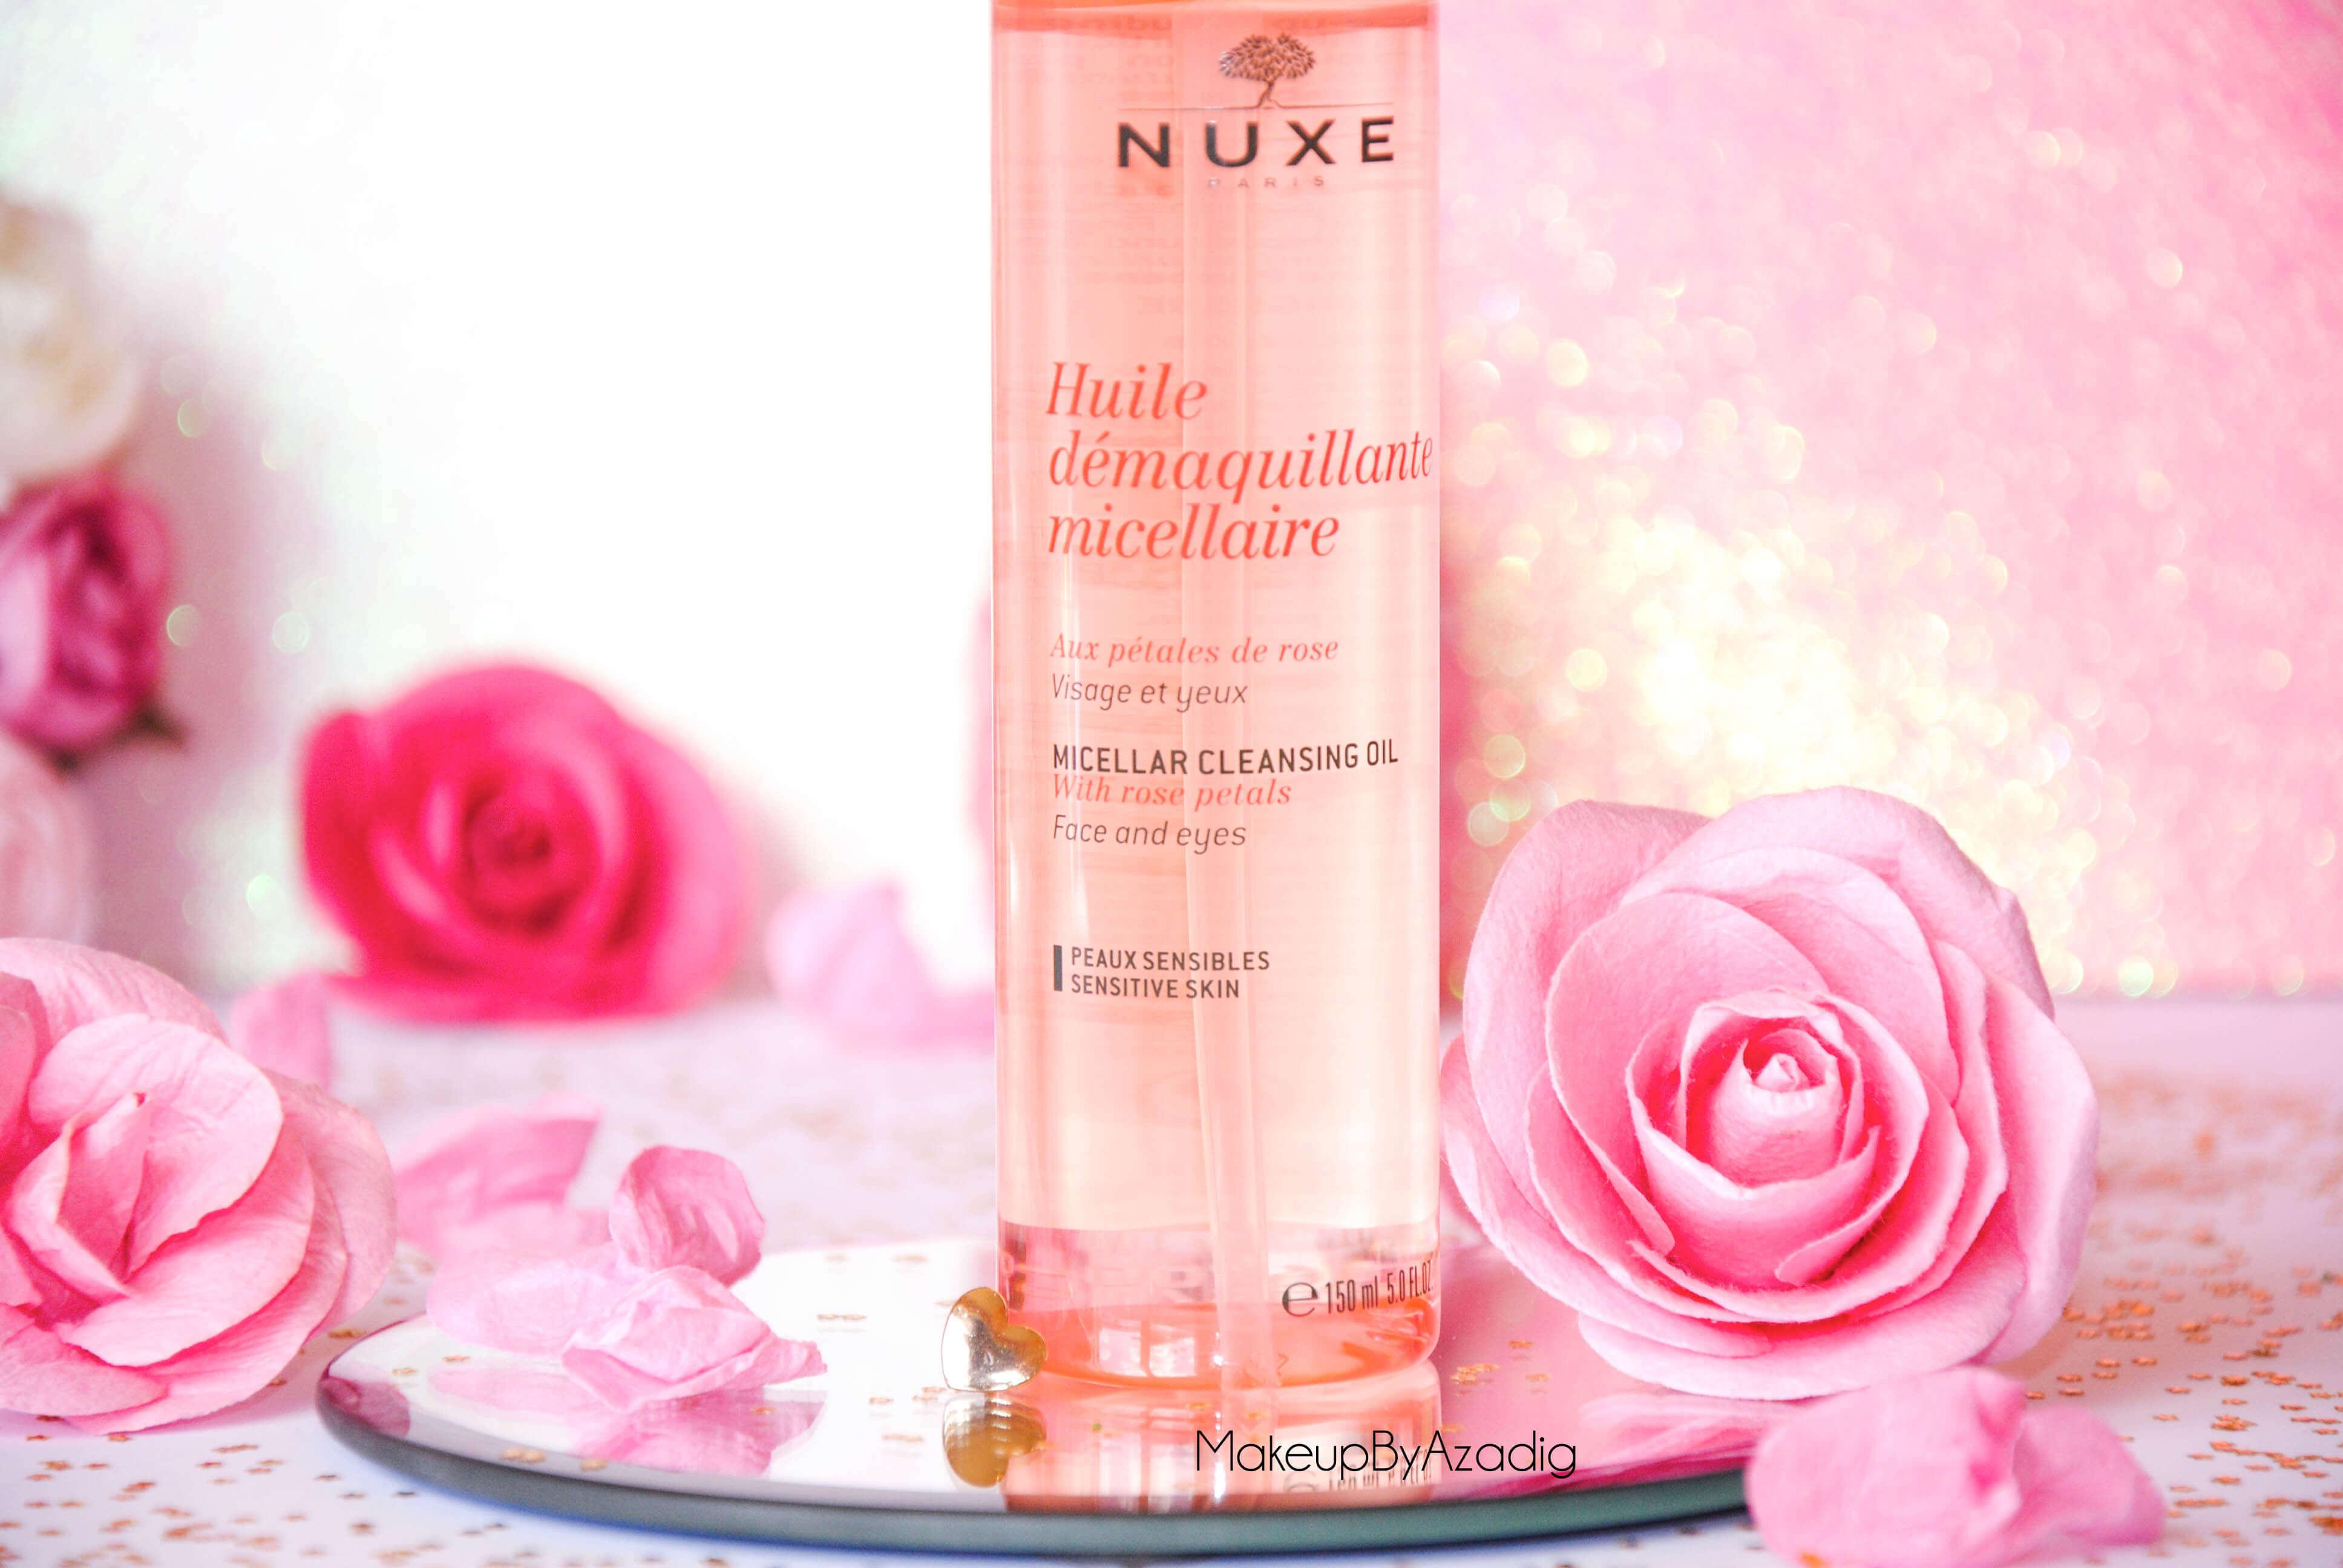 makeupbyazadig-huile-demaquillante-micellaire-nuxe-petales-de-rose-doctipharma-revue-avis-prix-peaux-sensibles